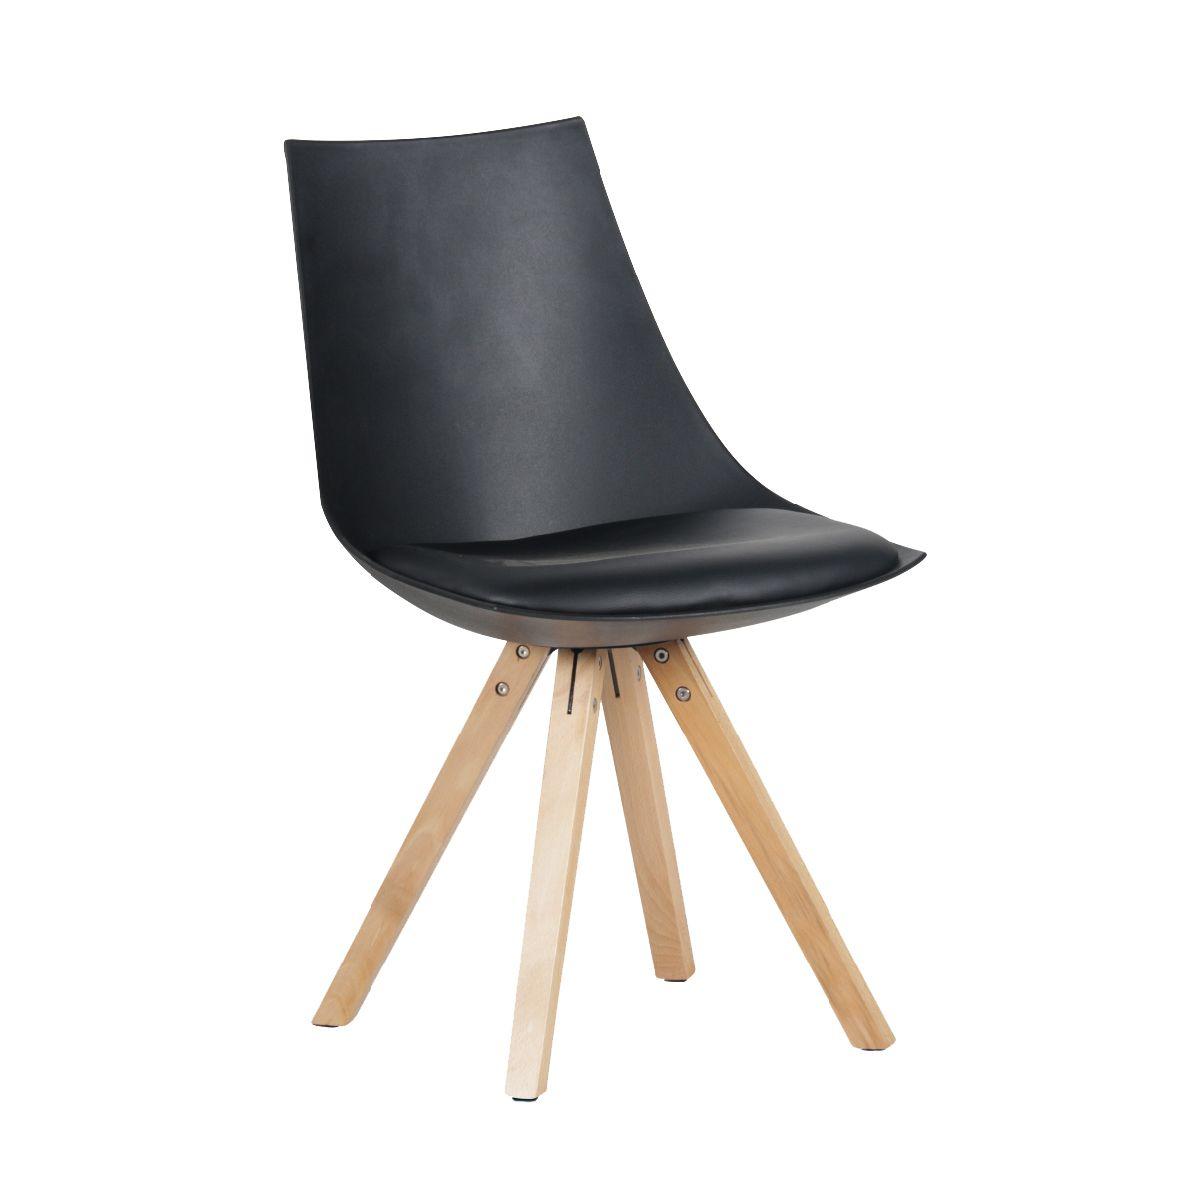 Altobuy hopen lot de 2 chaises noires neuf ebay - Lot de chaises noires ...